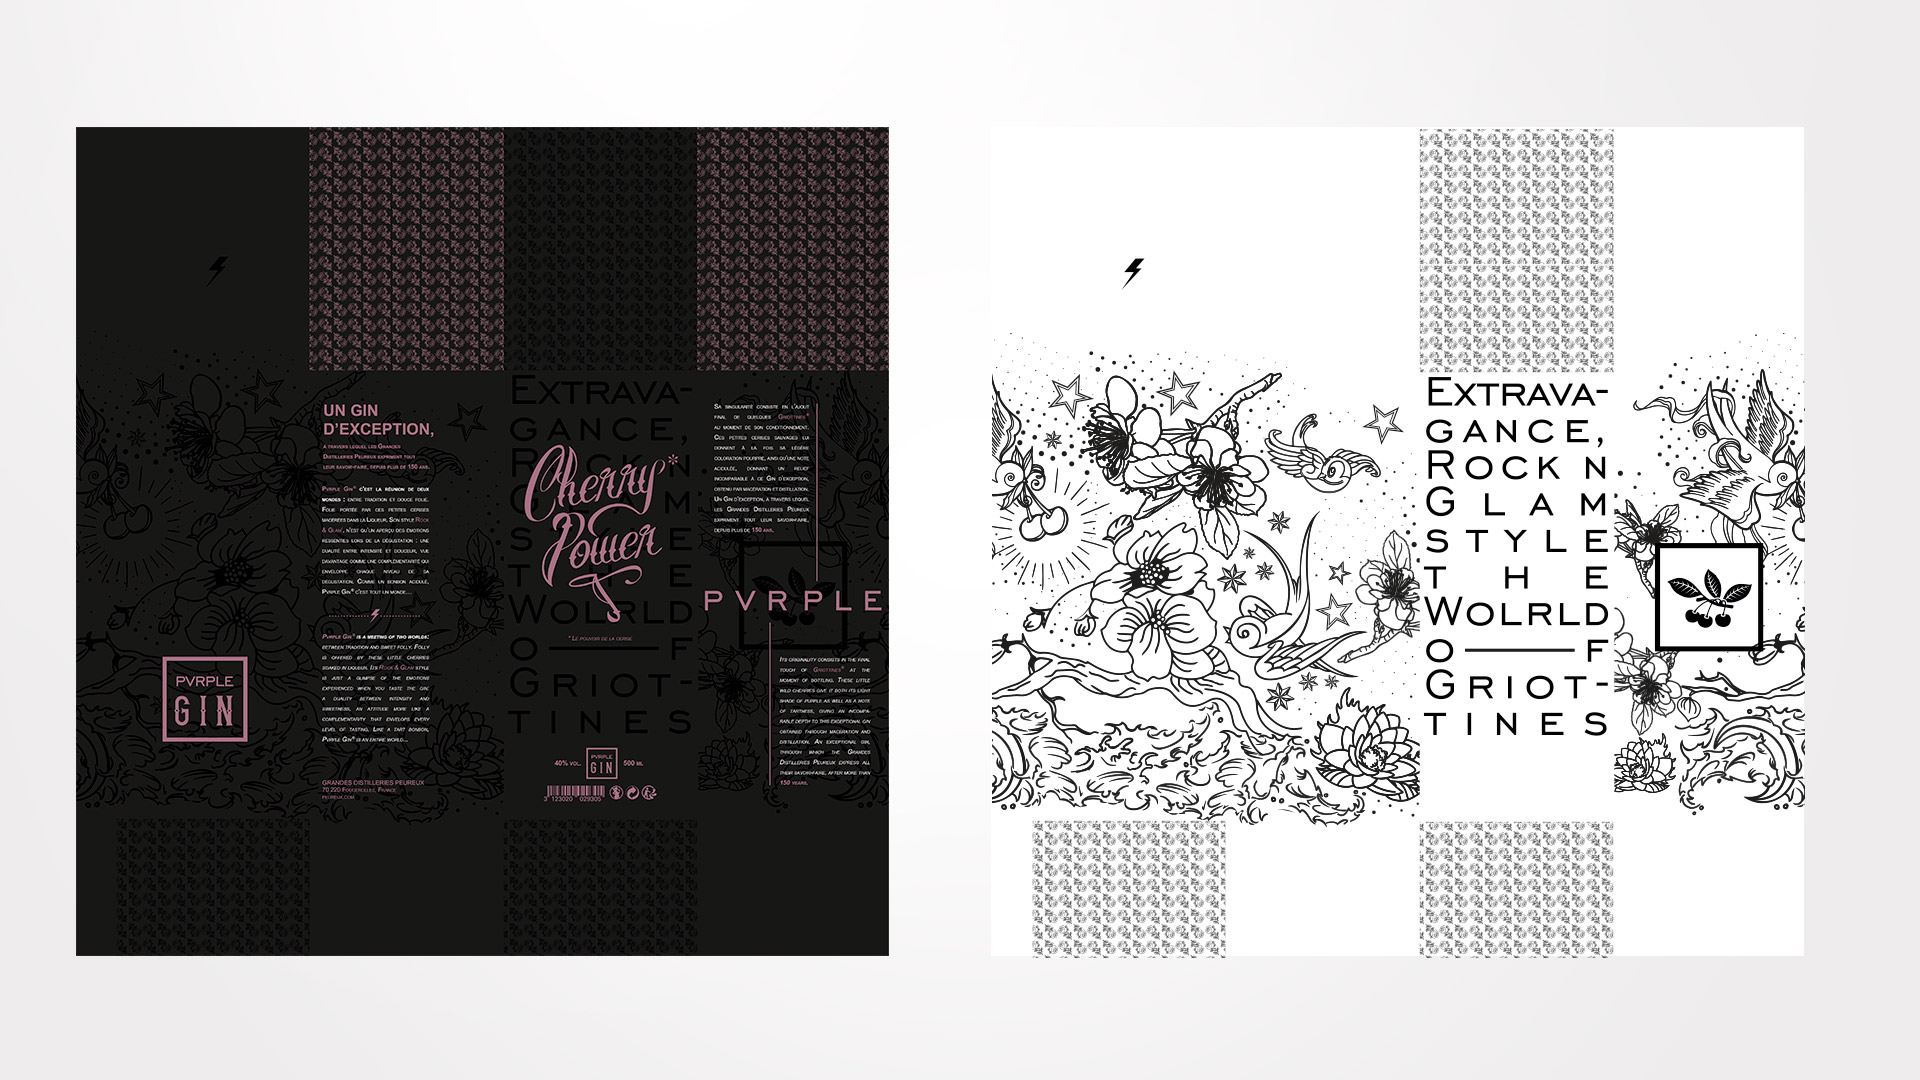 Template Packaging design Pvrple Gin